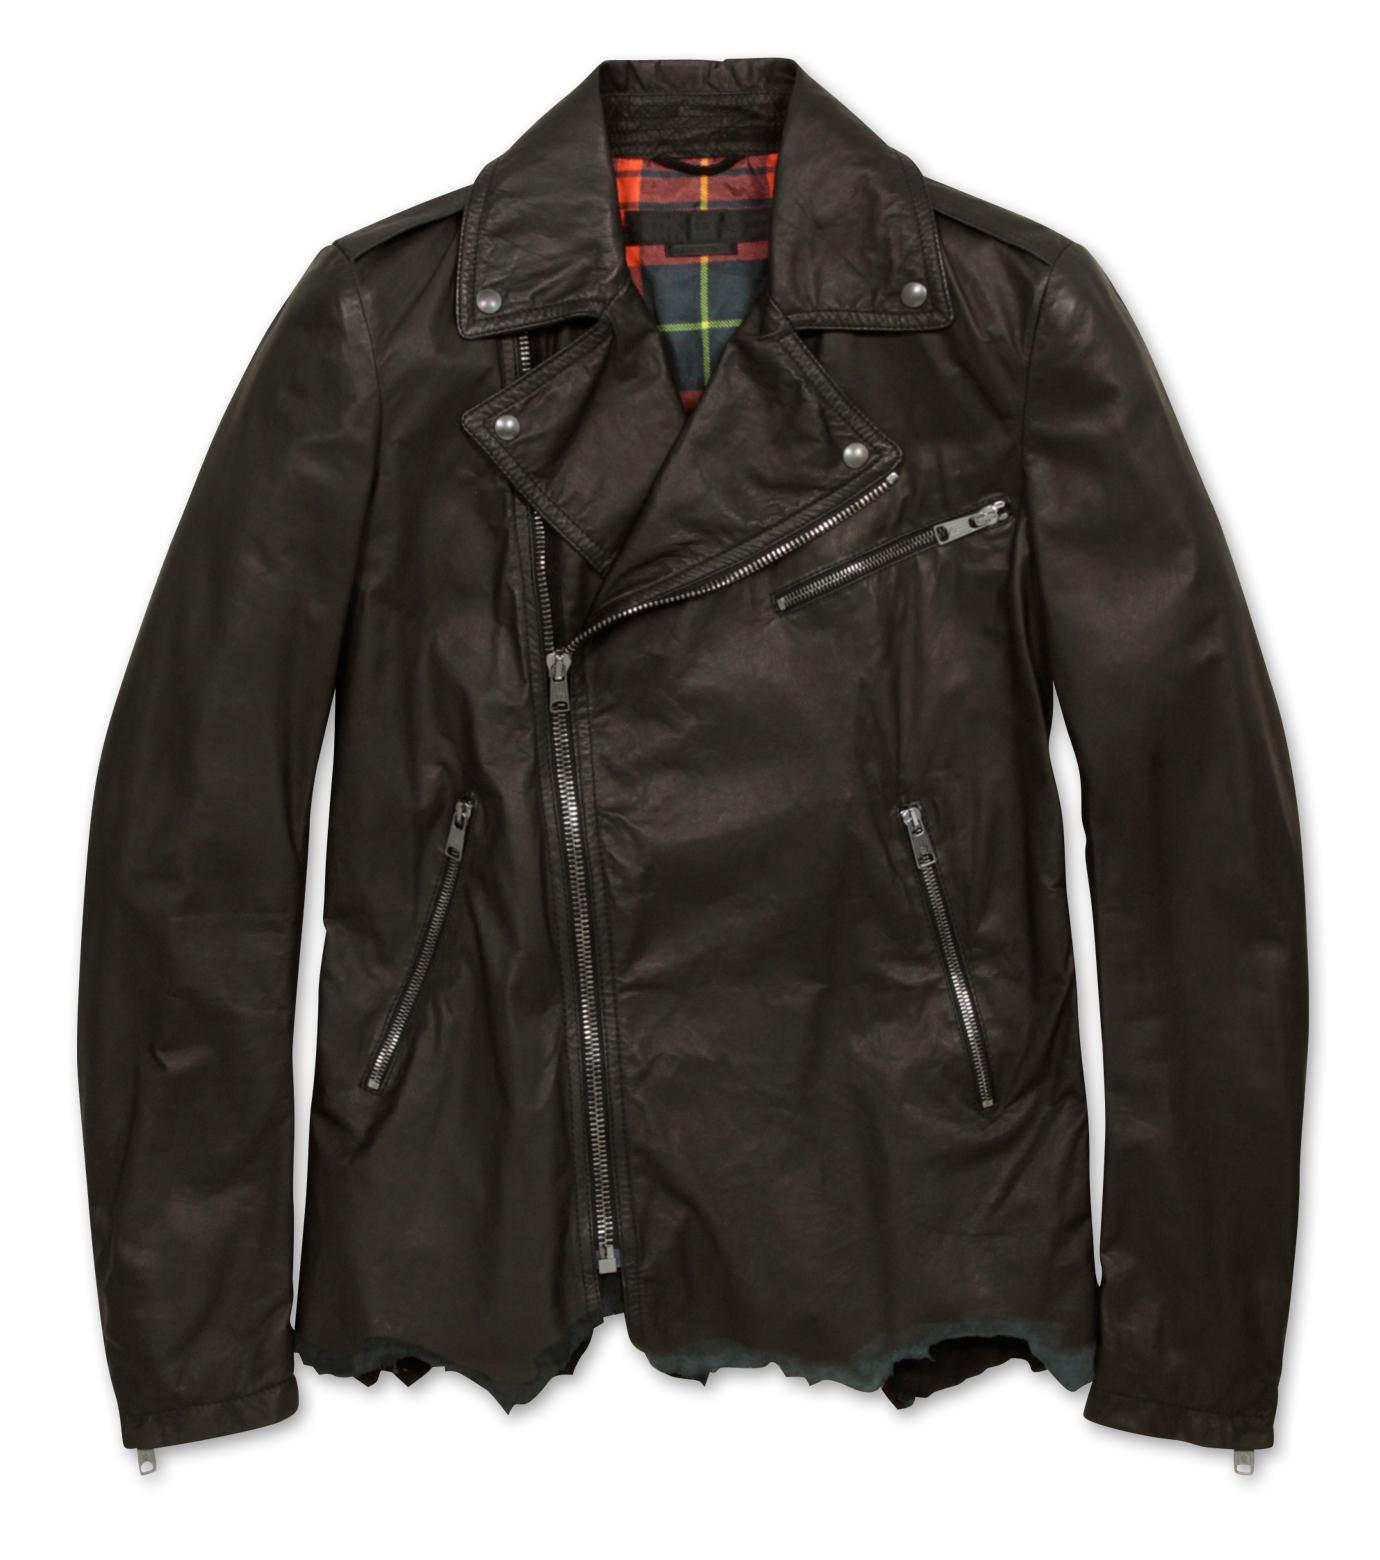 Alexander McQueen(アレキサンダーマックイーン)のCheck Riders-BLACK-261775 拡大詳細画像1